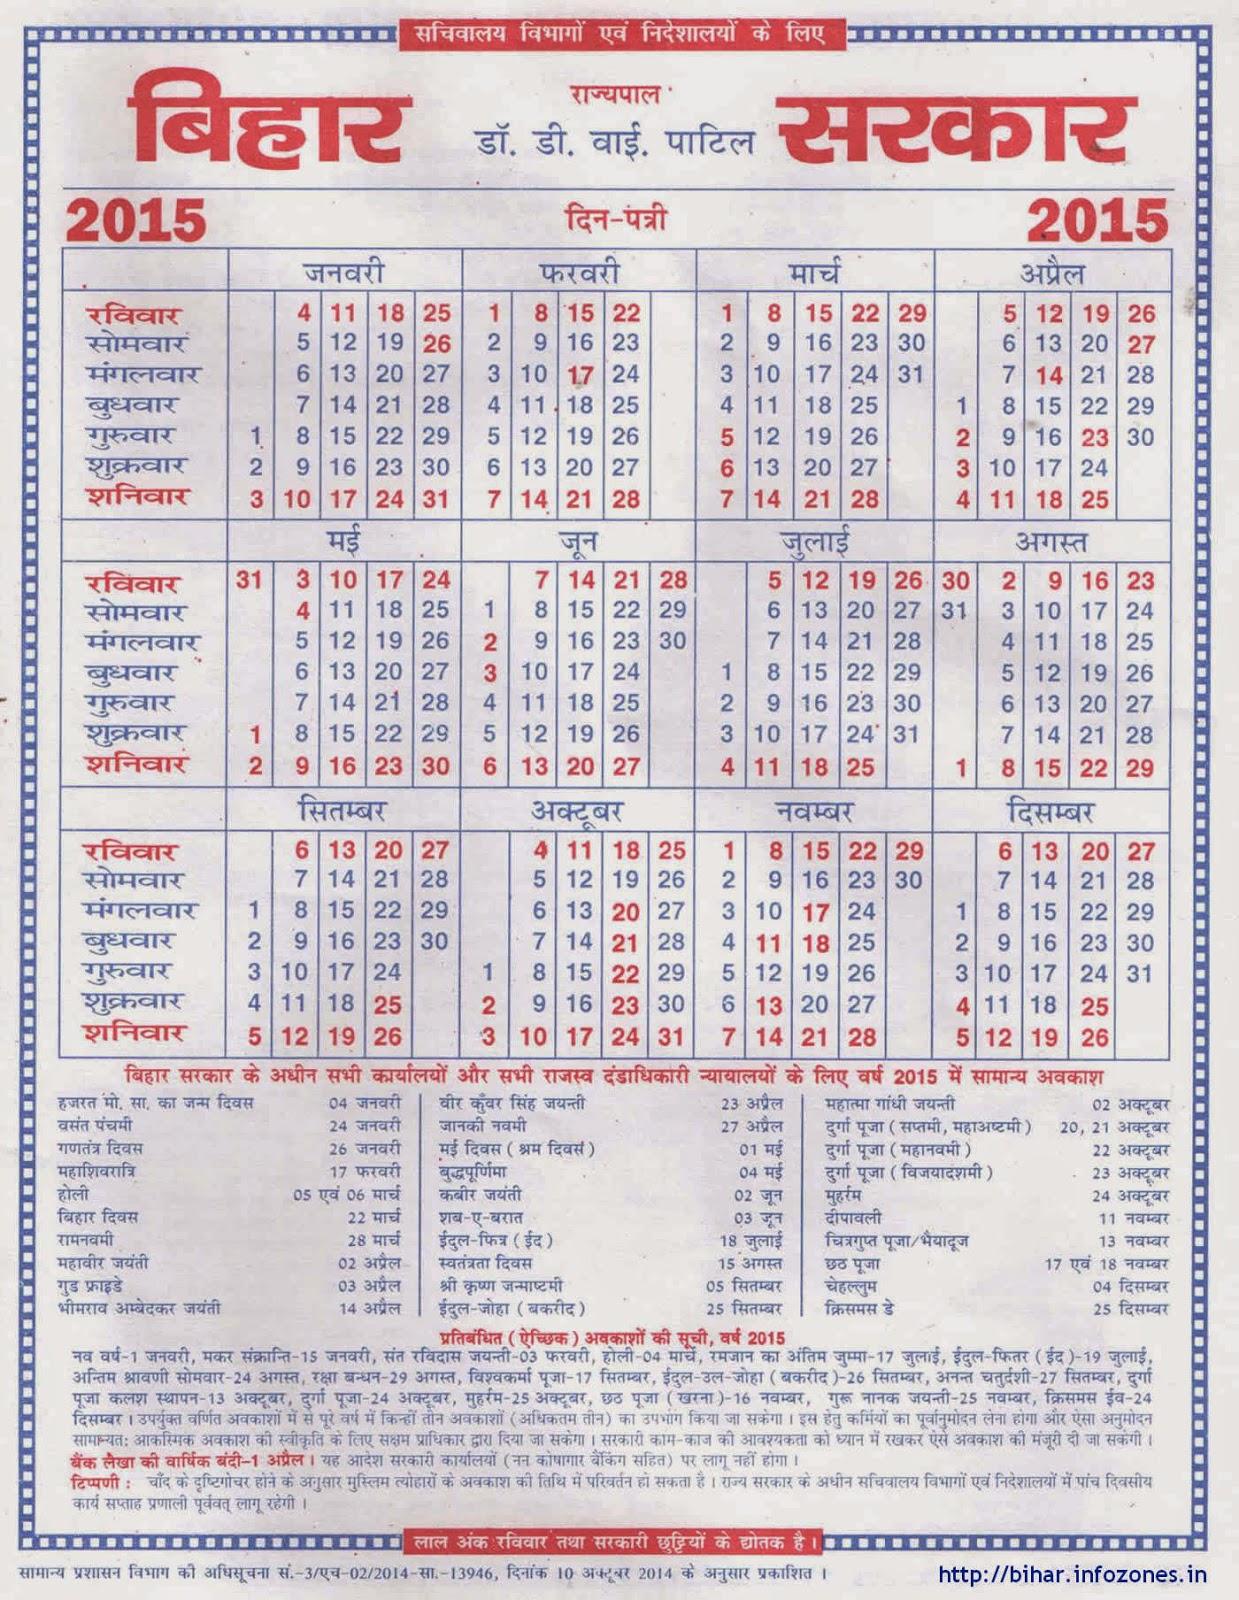 Forex association of india calendar 2014